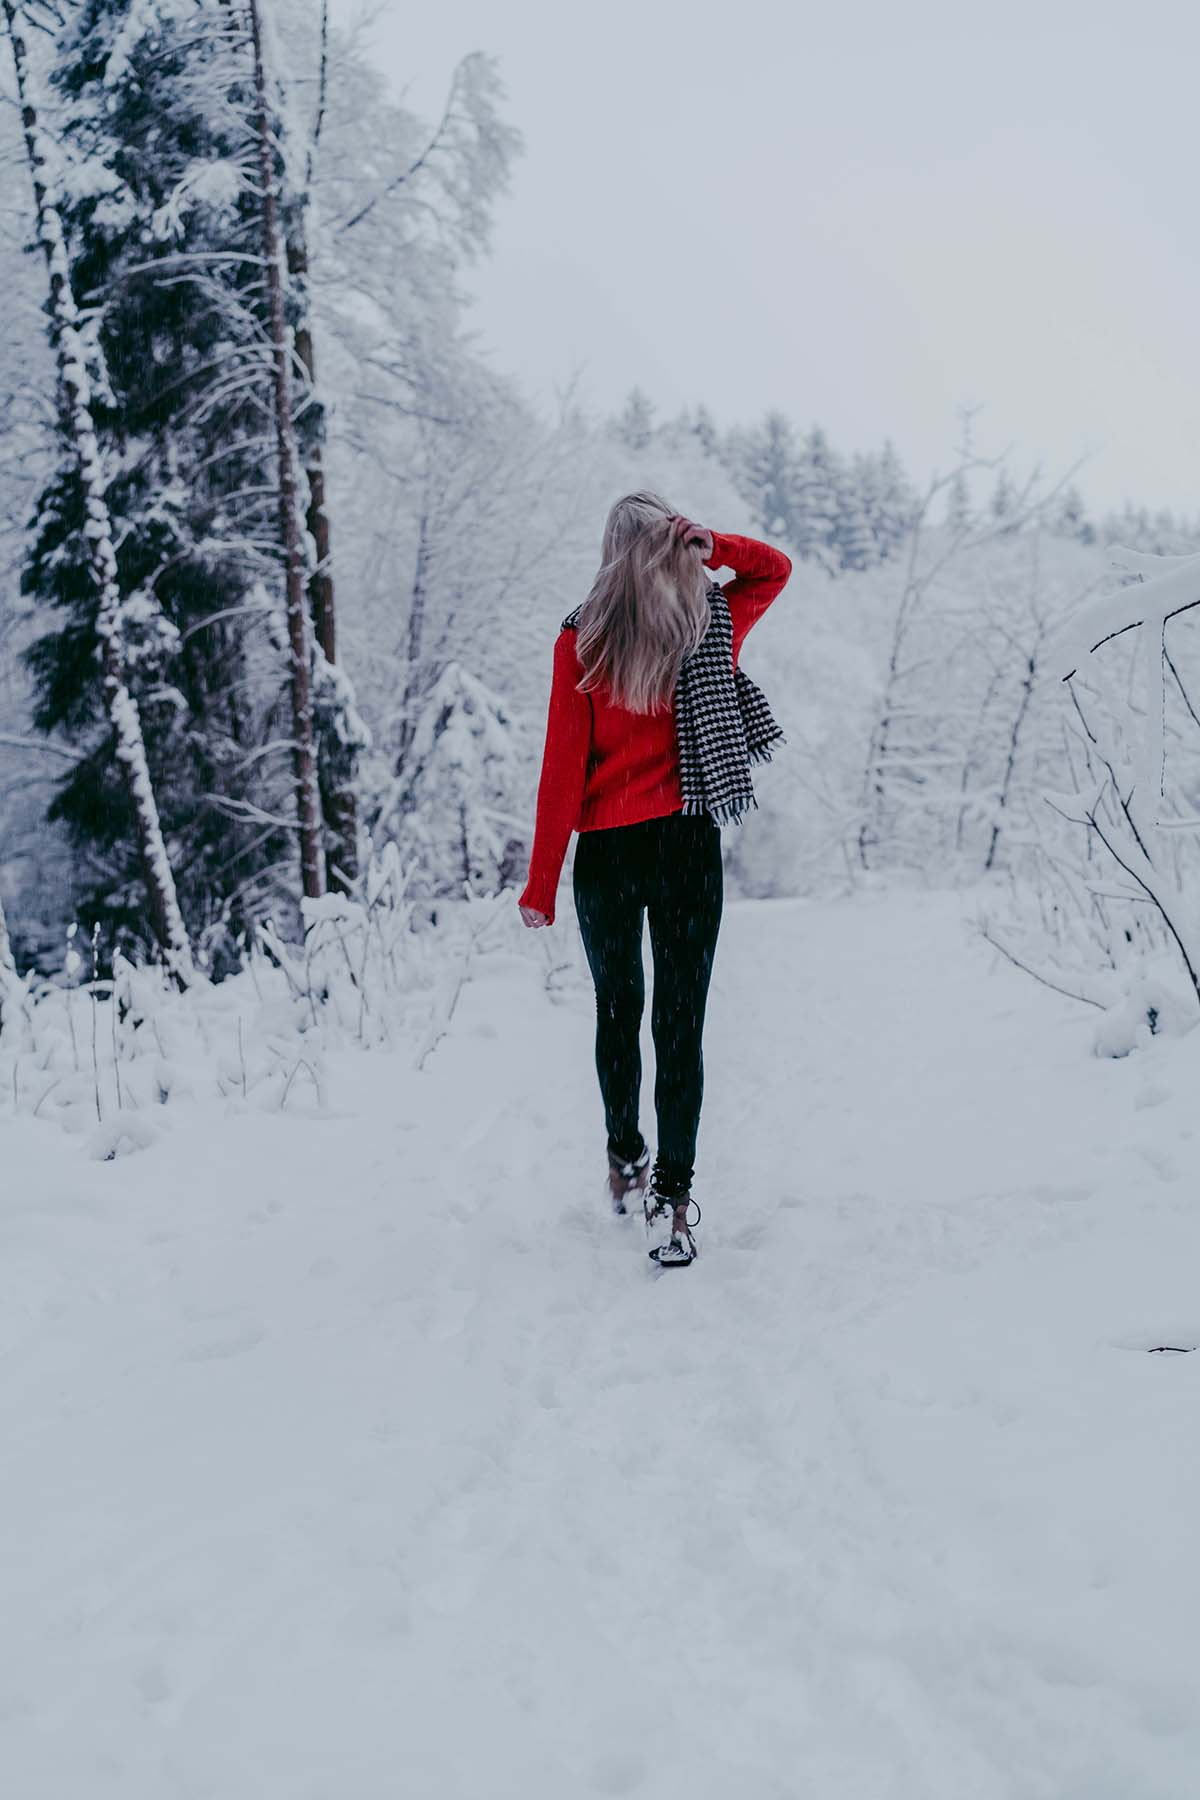 baernloch-winter-schnee-frau